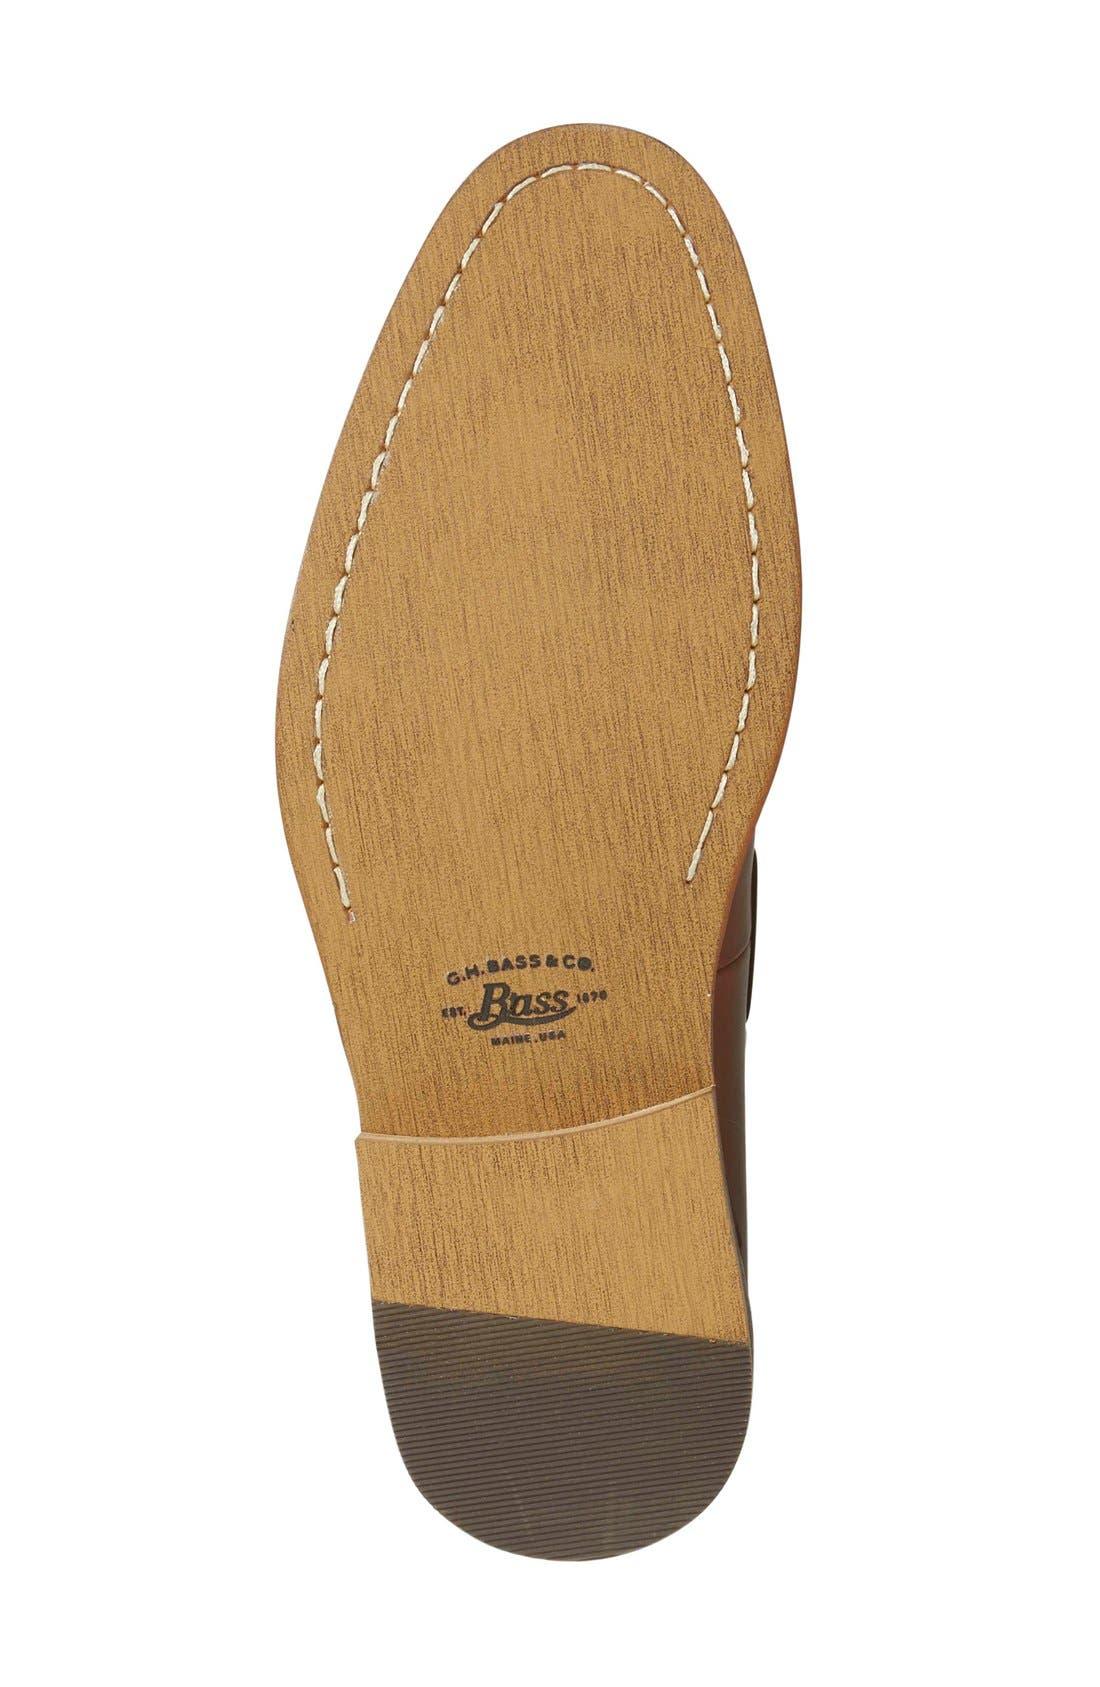 'Cooper' Tassel Loafer,                             Alternate thumbnail 4, color,                             Tan Leather